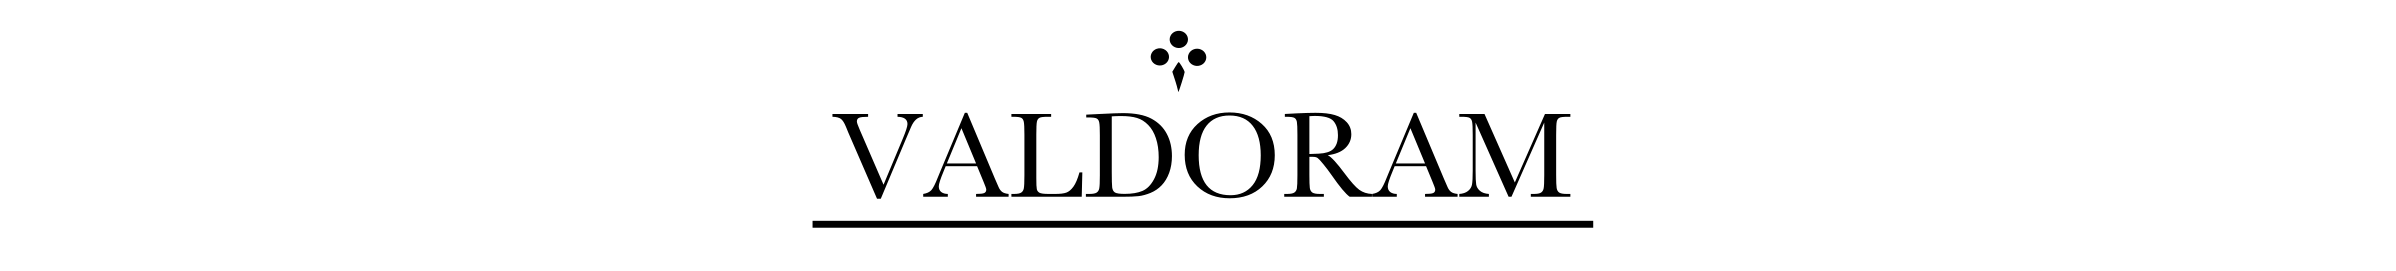 Valdoram